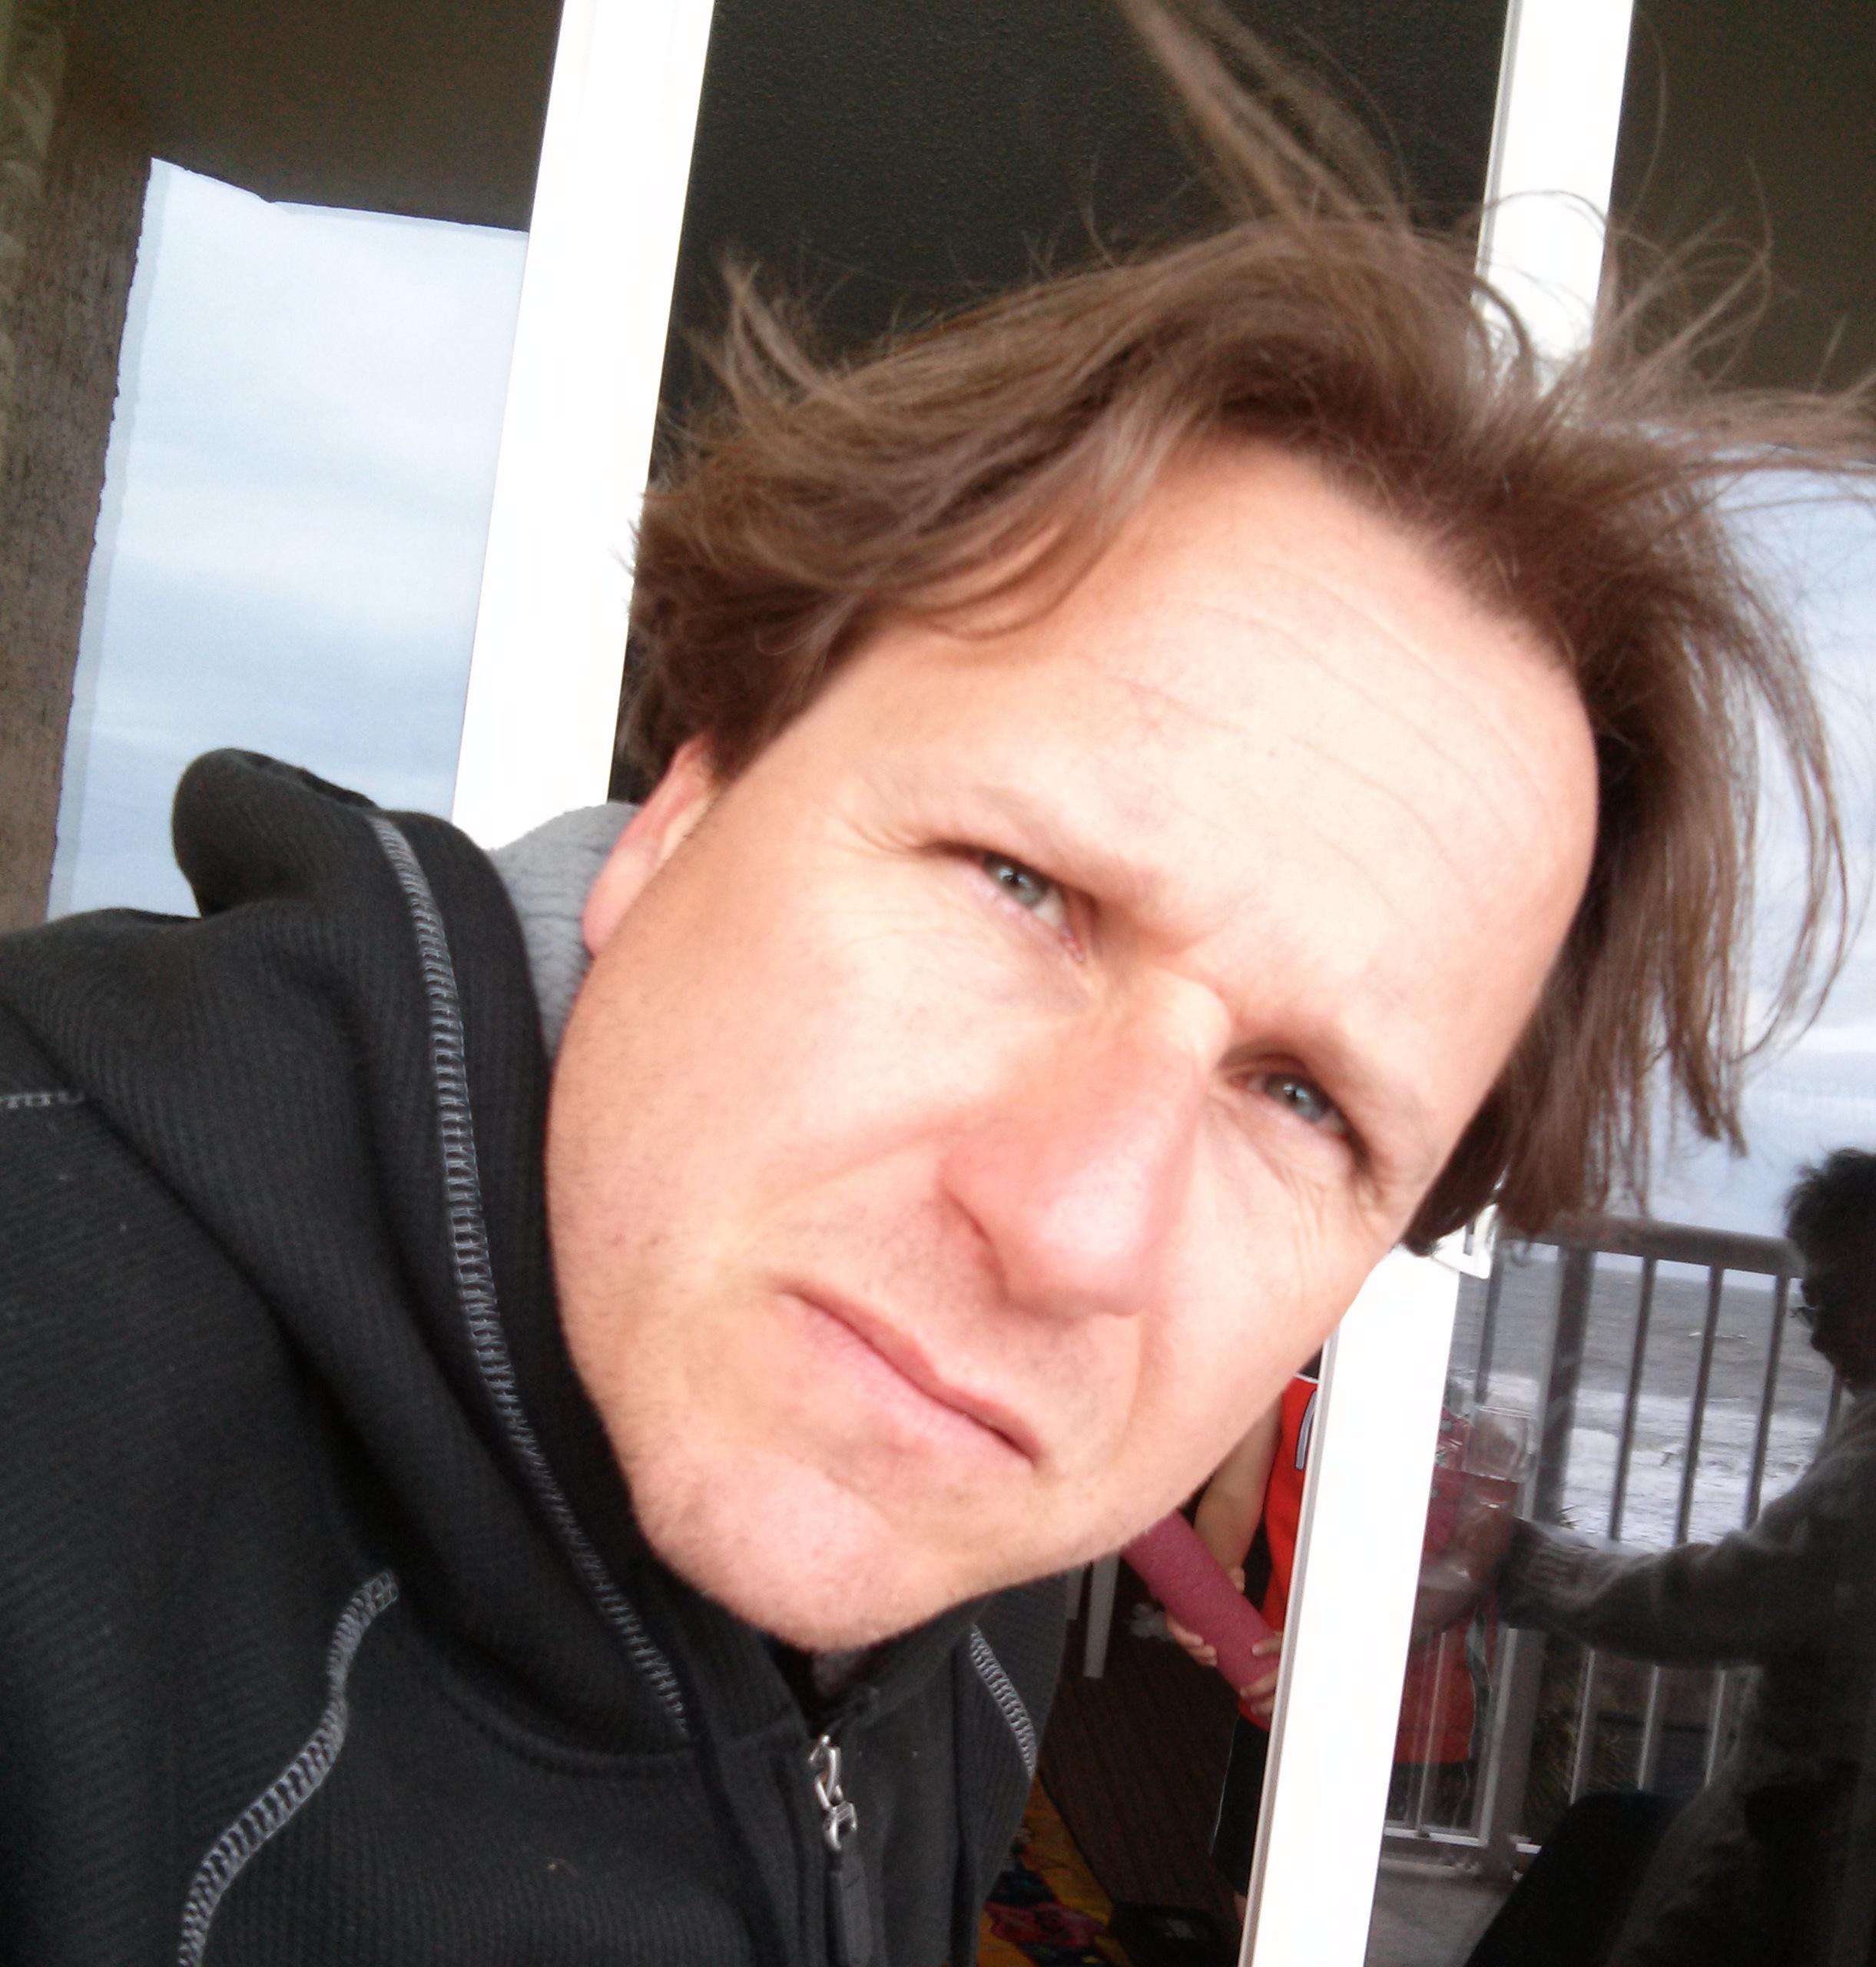 Marco Wotschka